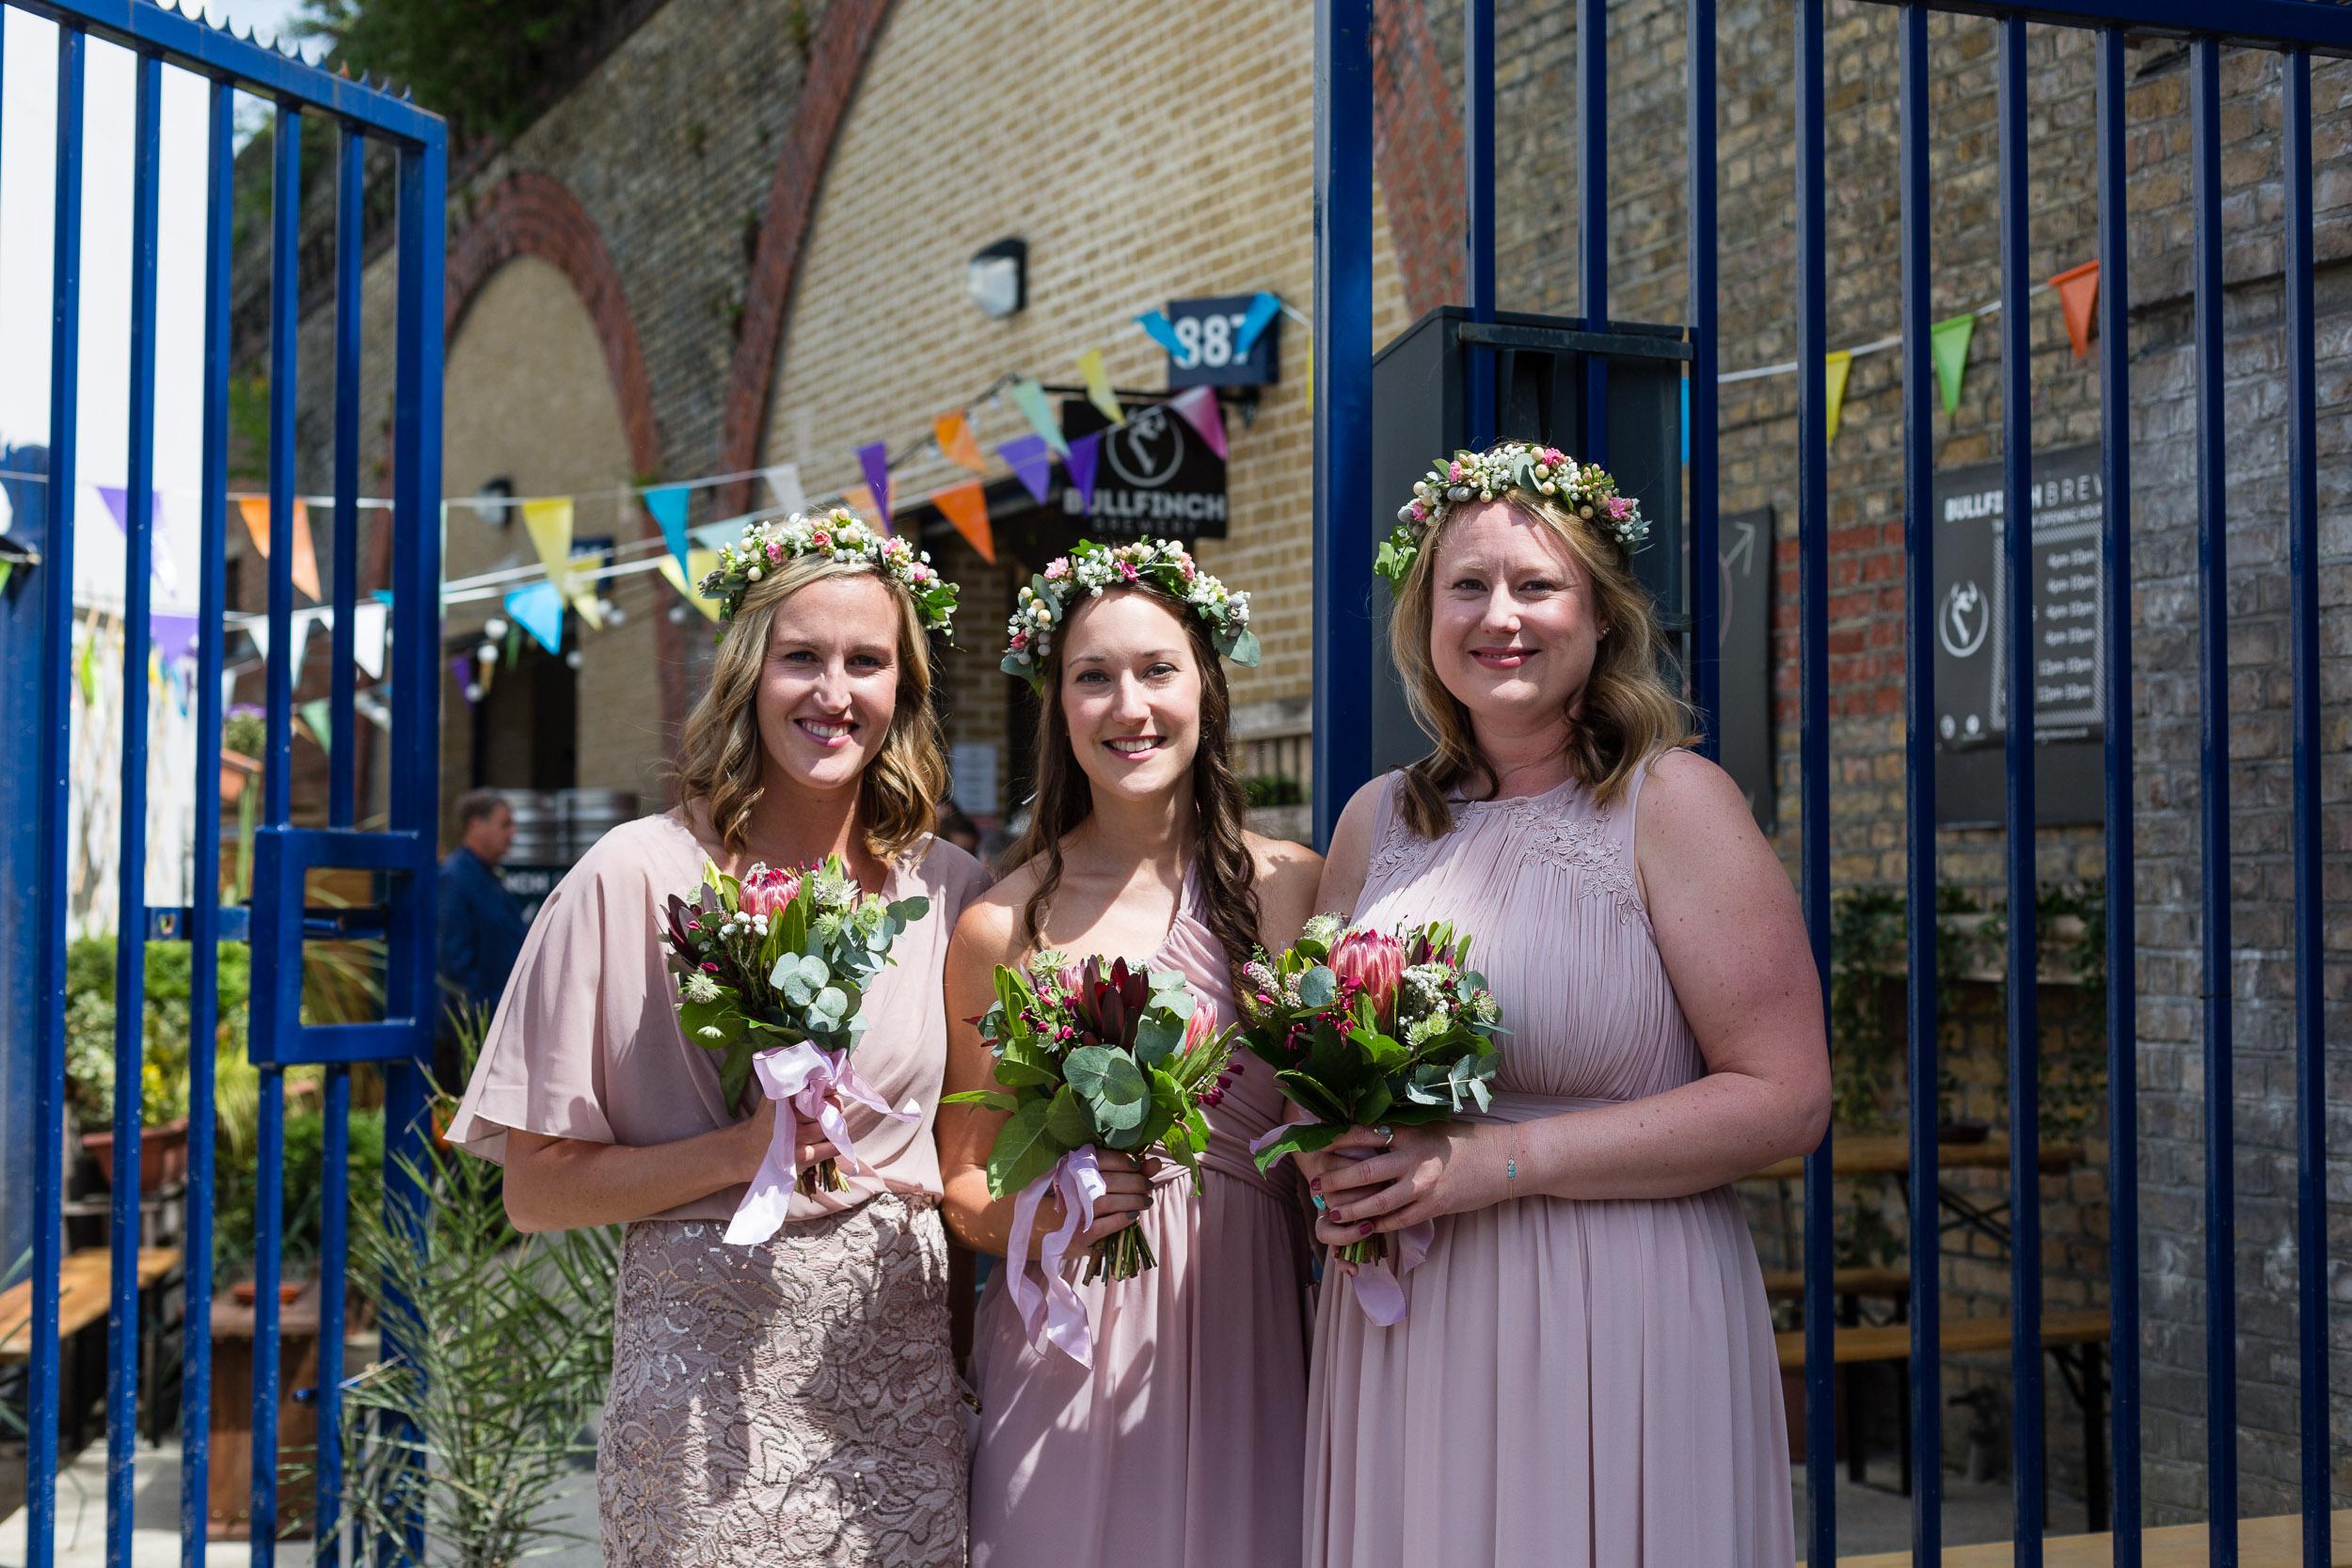 brockwell-lido-brixton-herne-hill-wedding-022.jpg